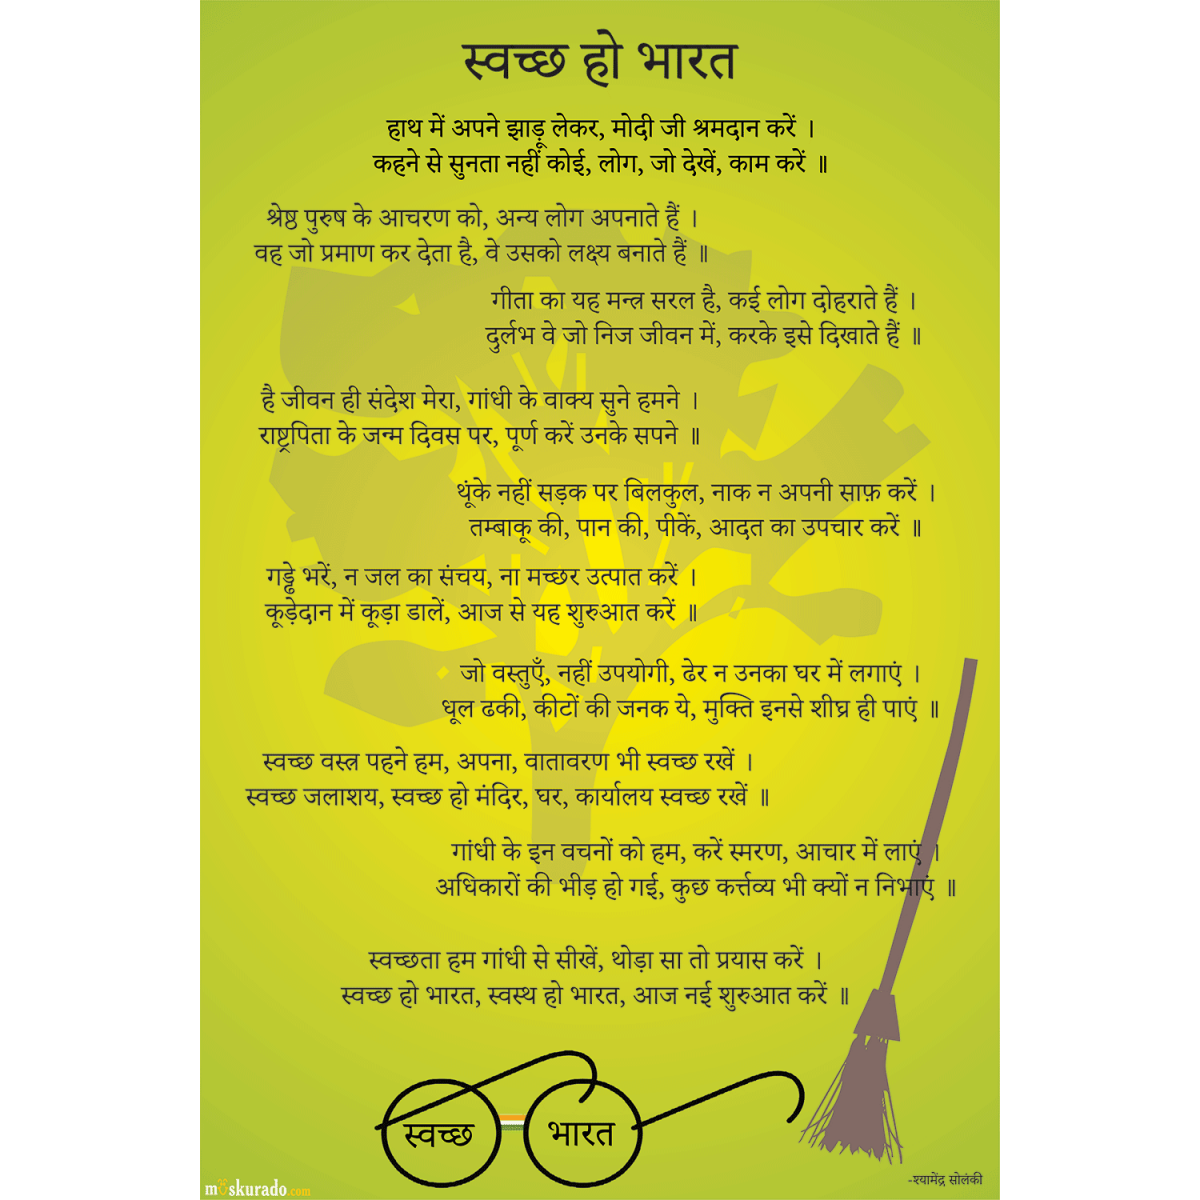 Buy clean india hindi poem posters